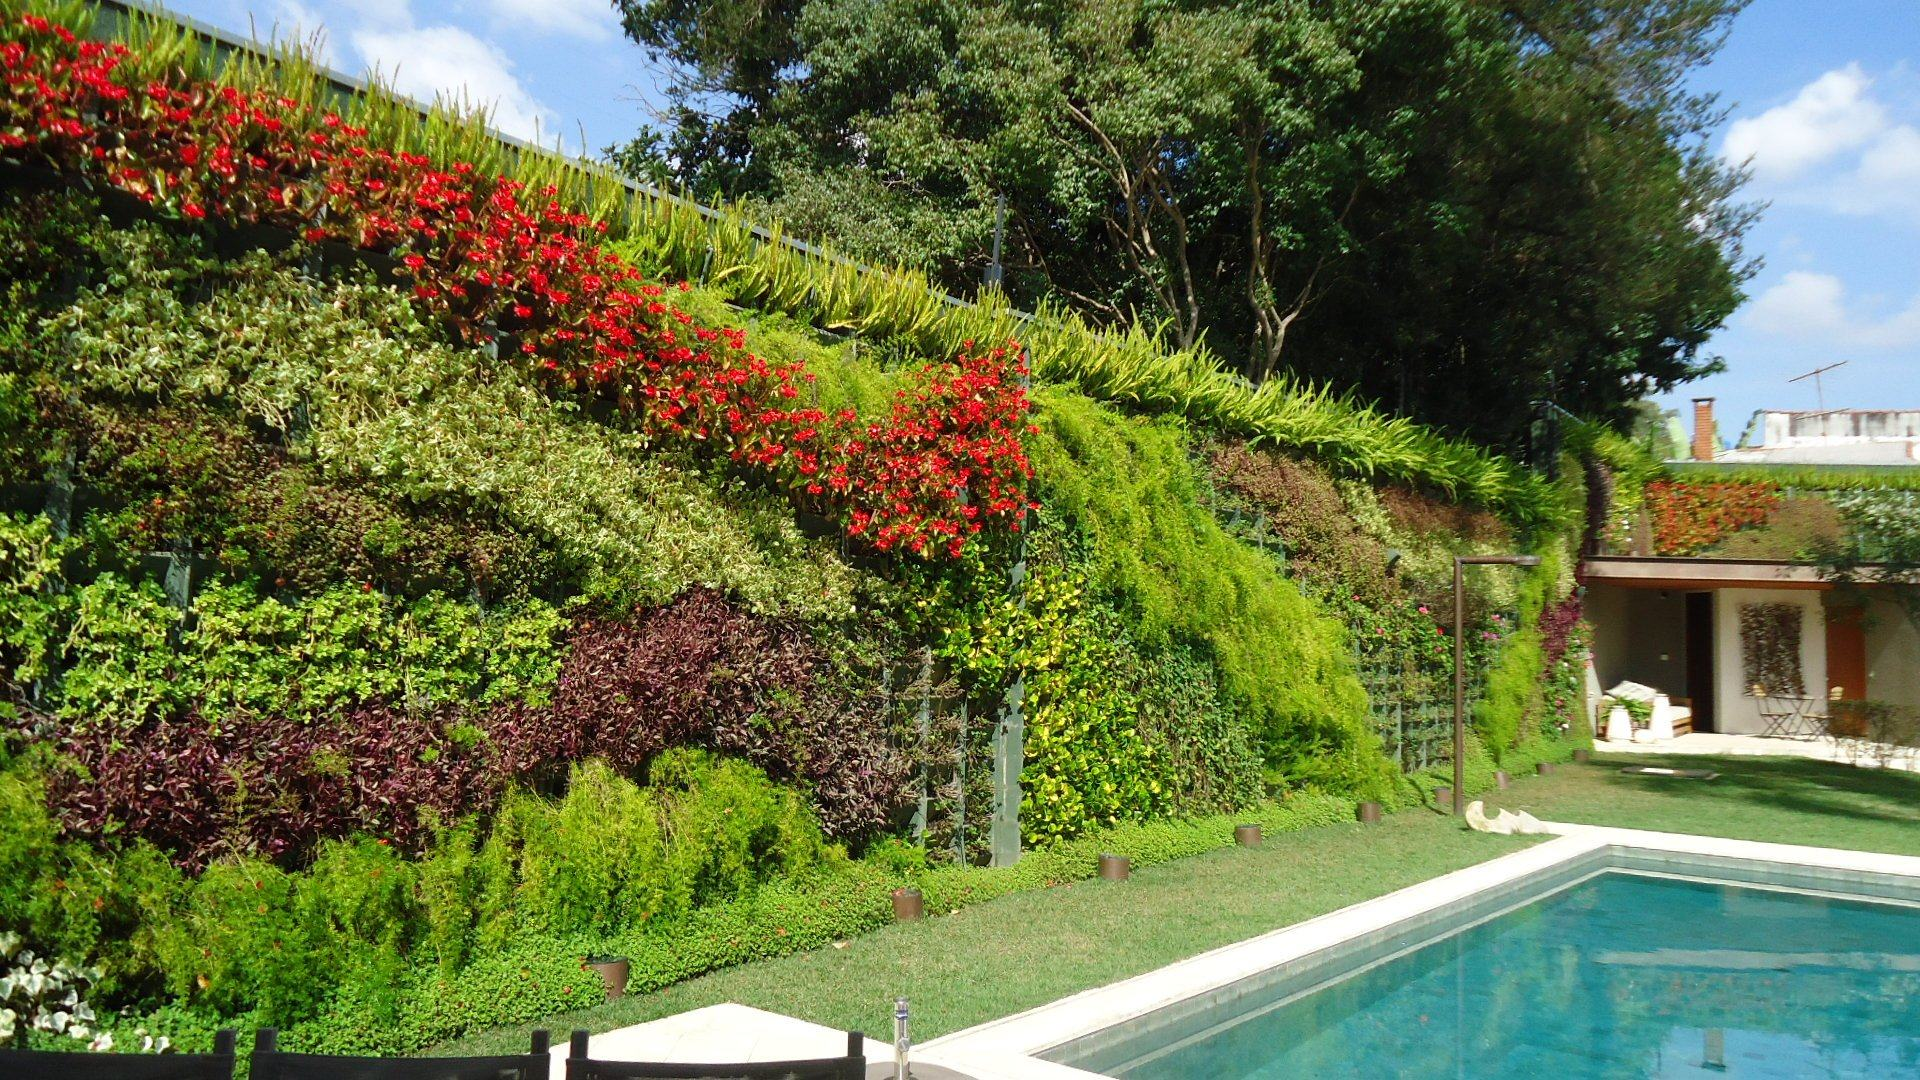 jardim vertical no sol:Lindas fotos jardim vertical na parede